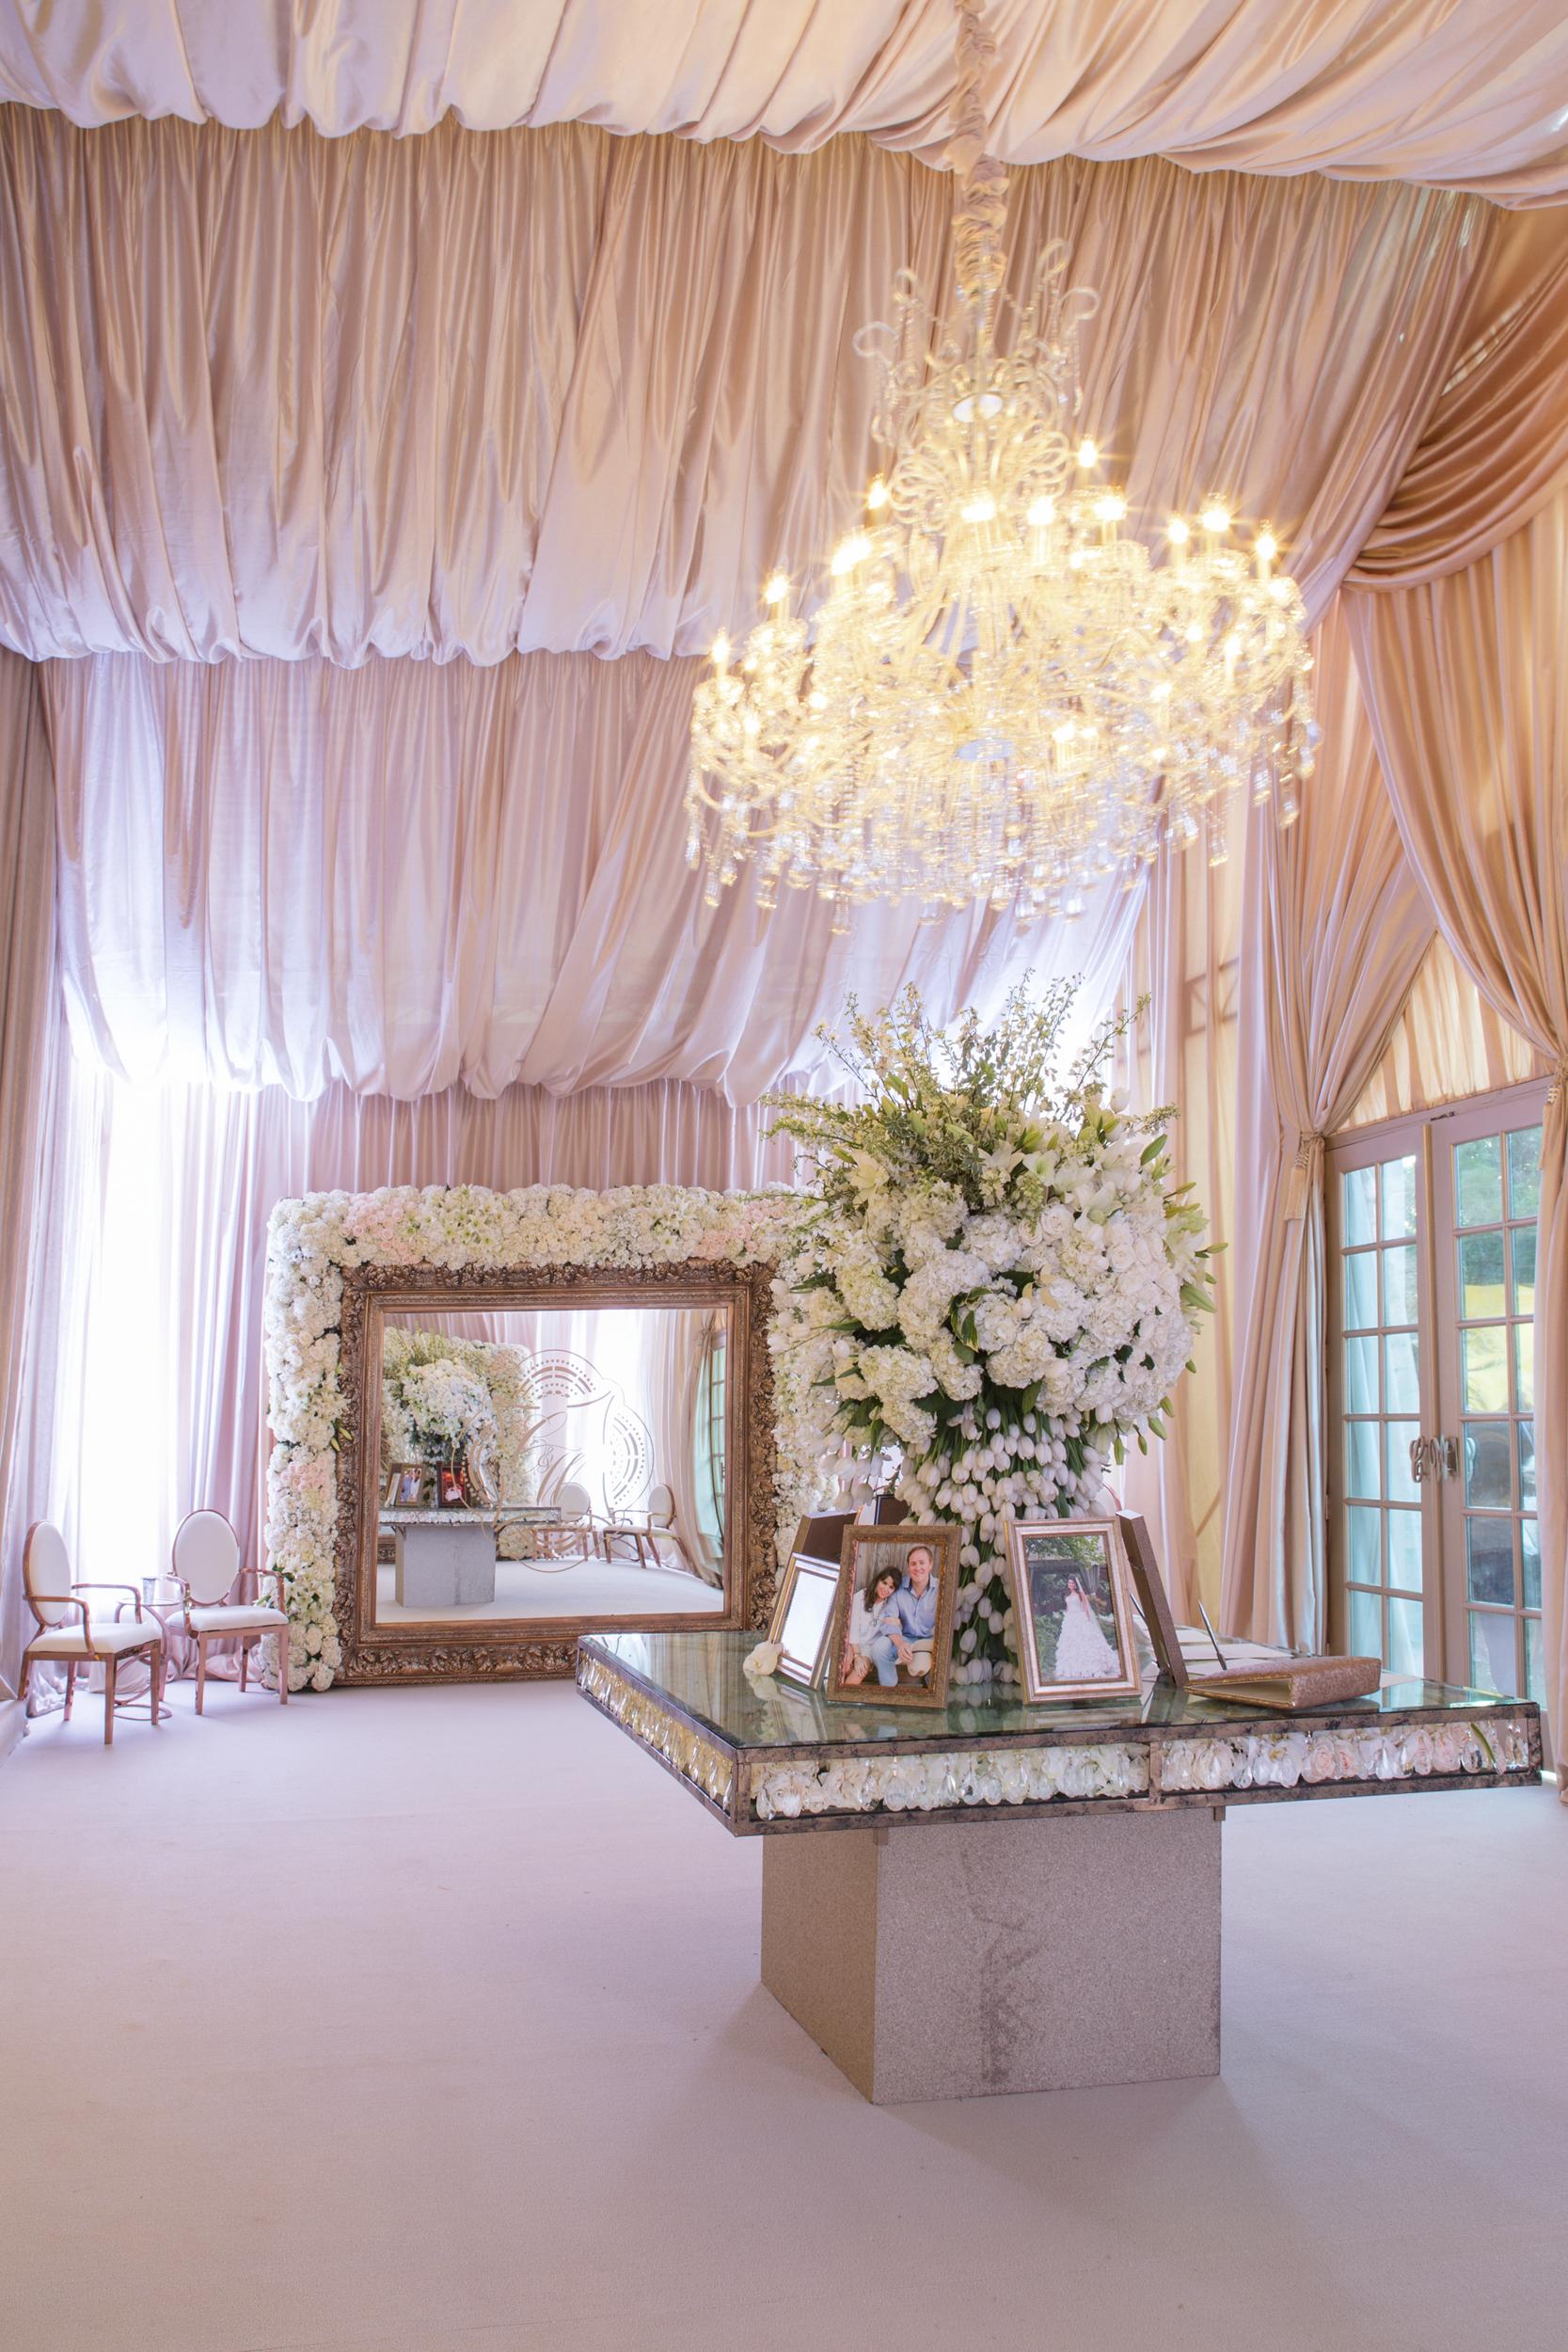 gold_deco_luxe_lavish_wedding_couture_luxury_invitation_design_lasercut_foil_glam_gilded_modern_sophisticated_midland_texas_invitations_suite_the_racquet_club-38.jpg